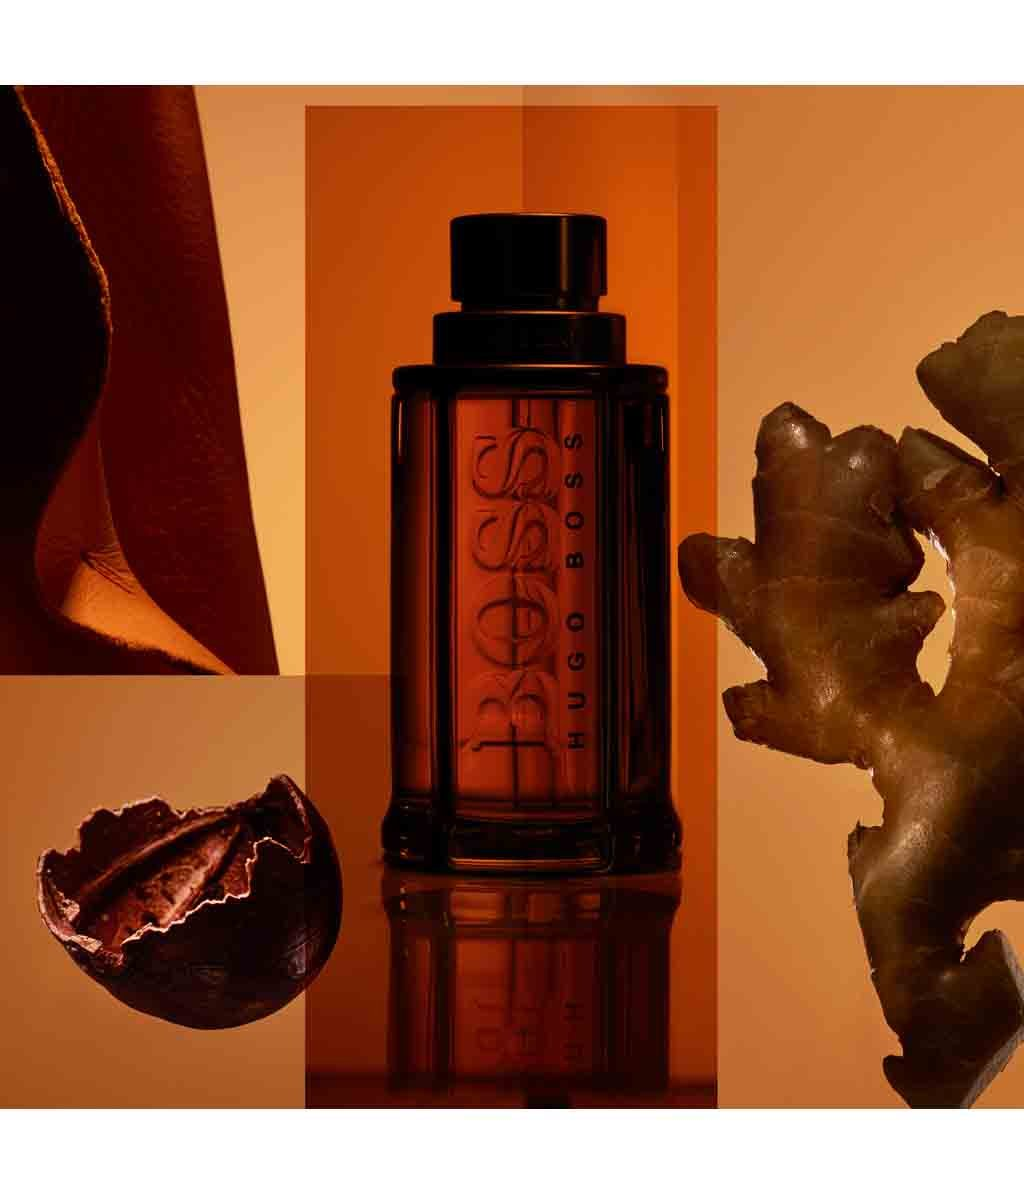 hugo boss the scent online bestellen flaconi. Black Bedroom Furniture Sets. Home Design Ideas